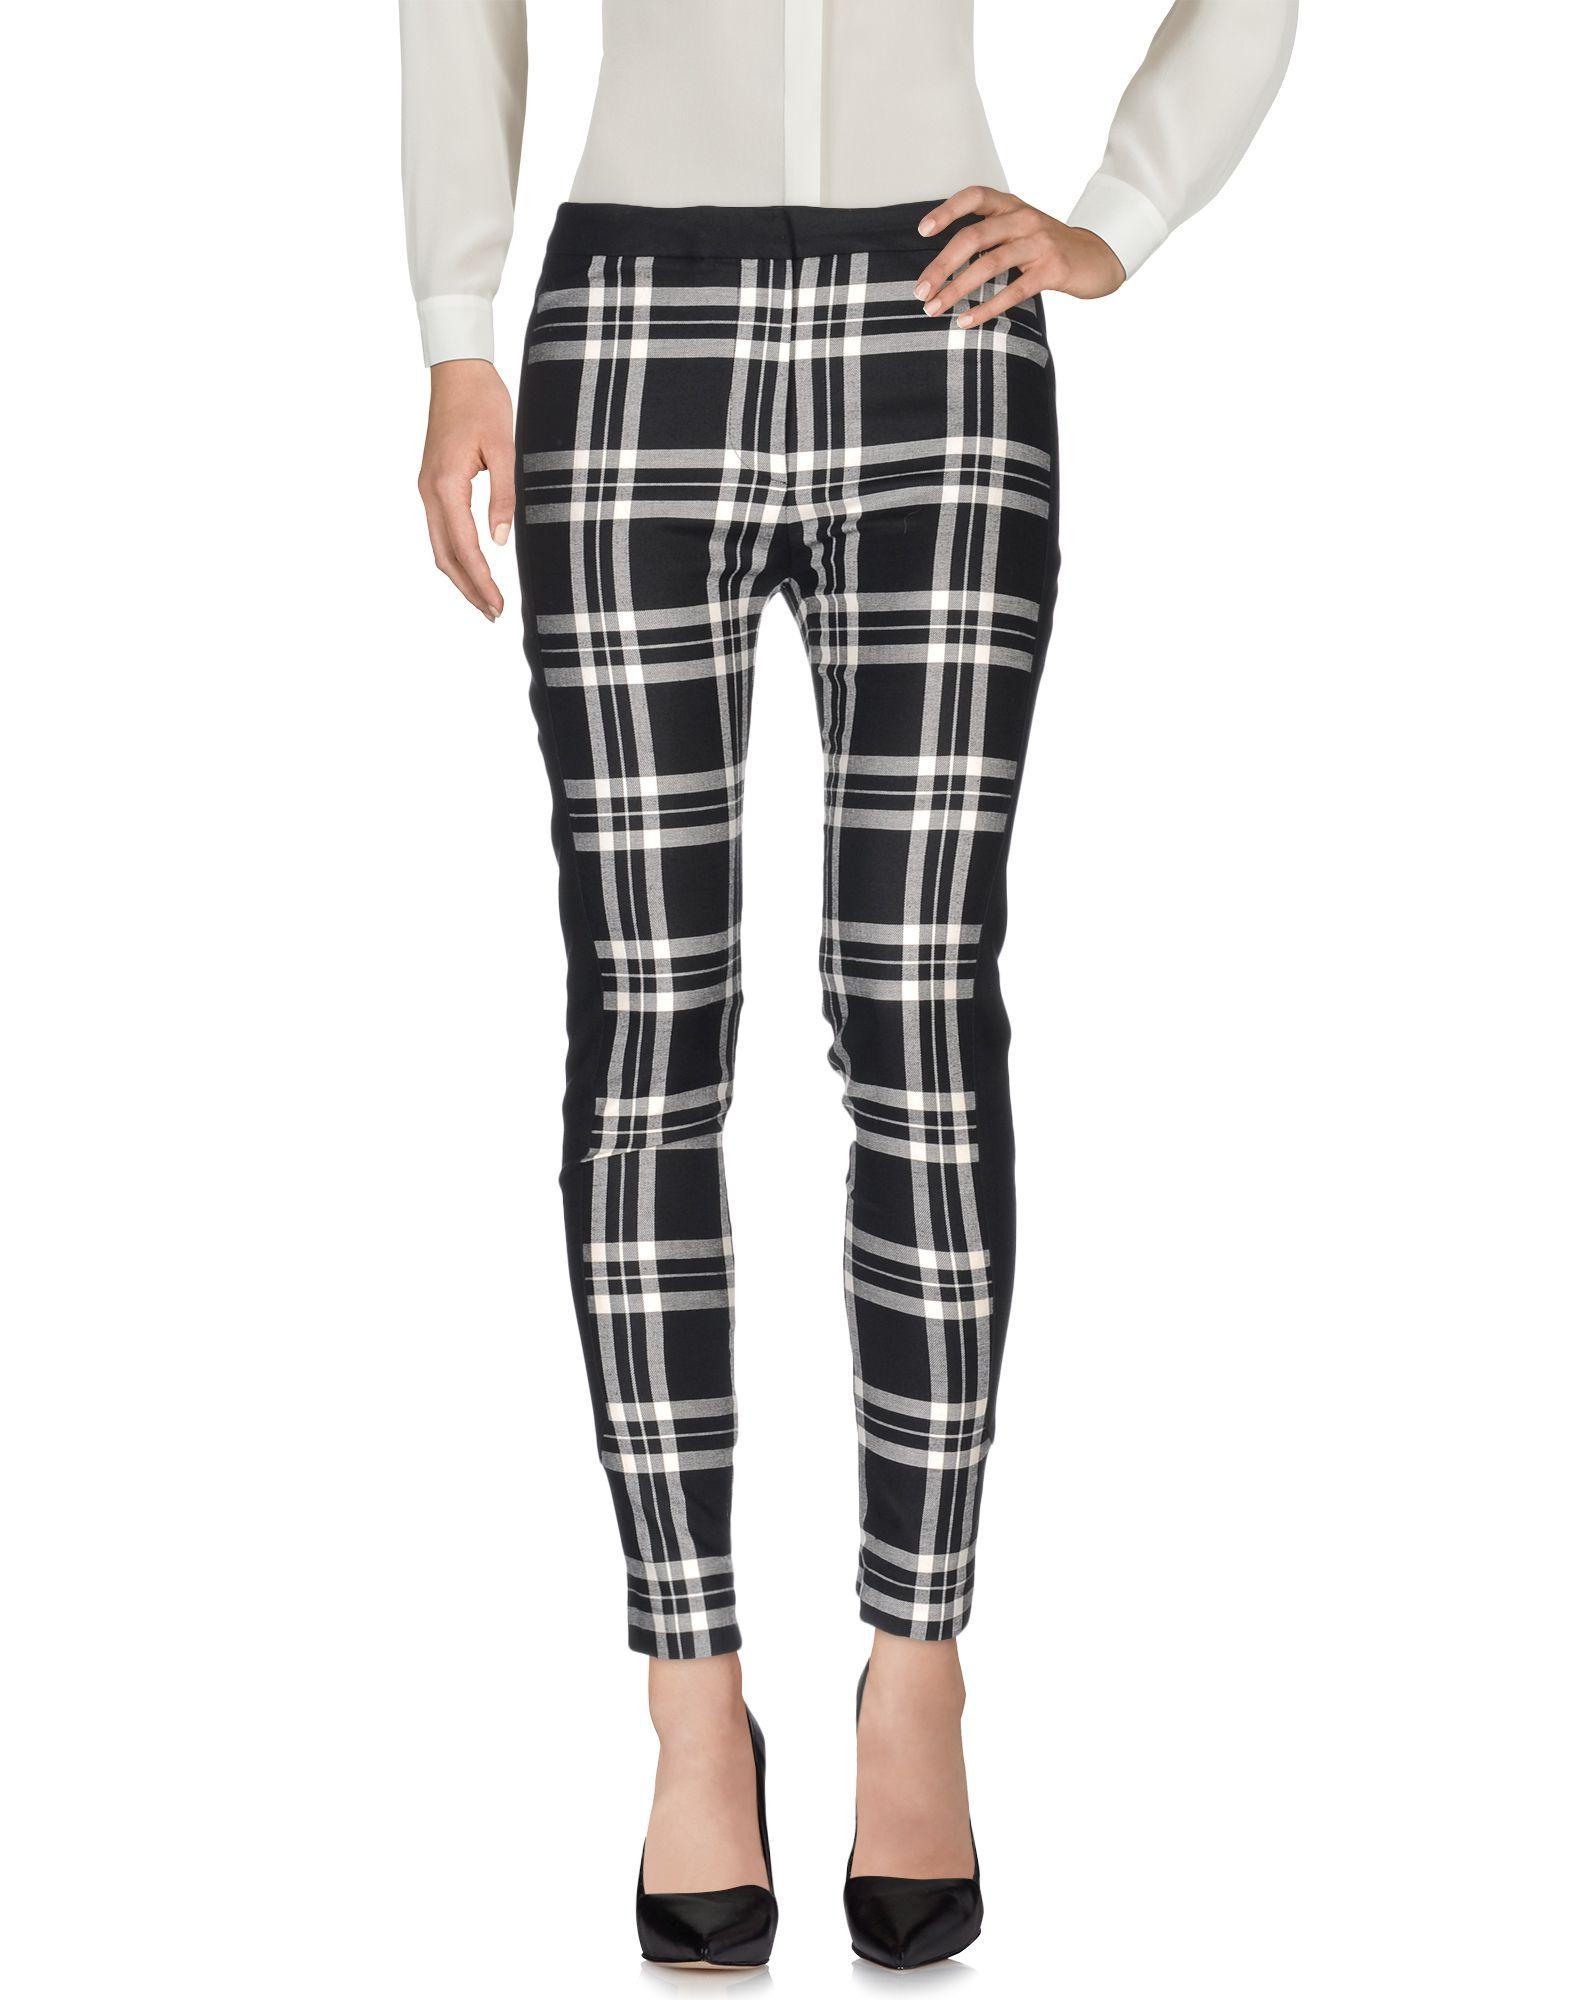 Pantalone Mangano Donna - Acquista online su GkbjjYdkue